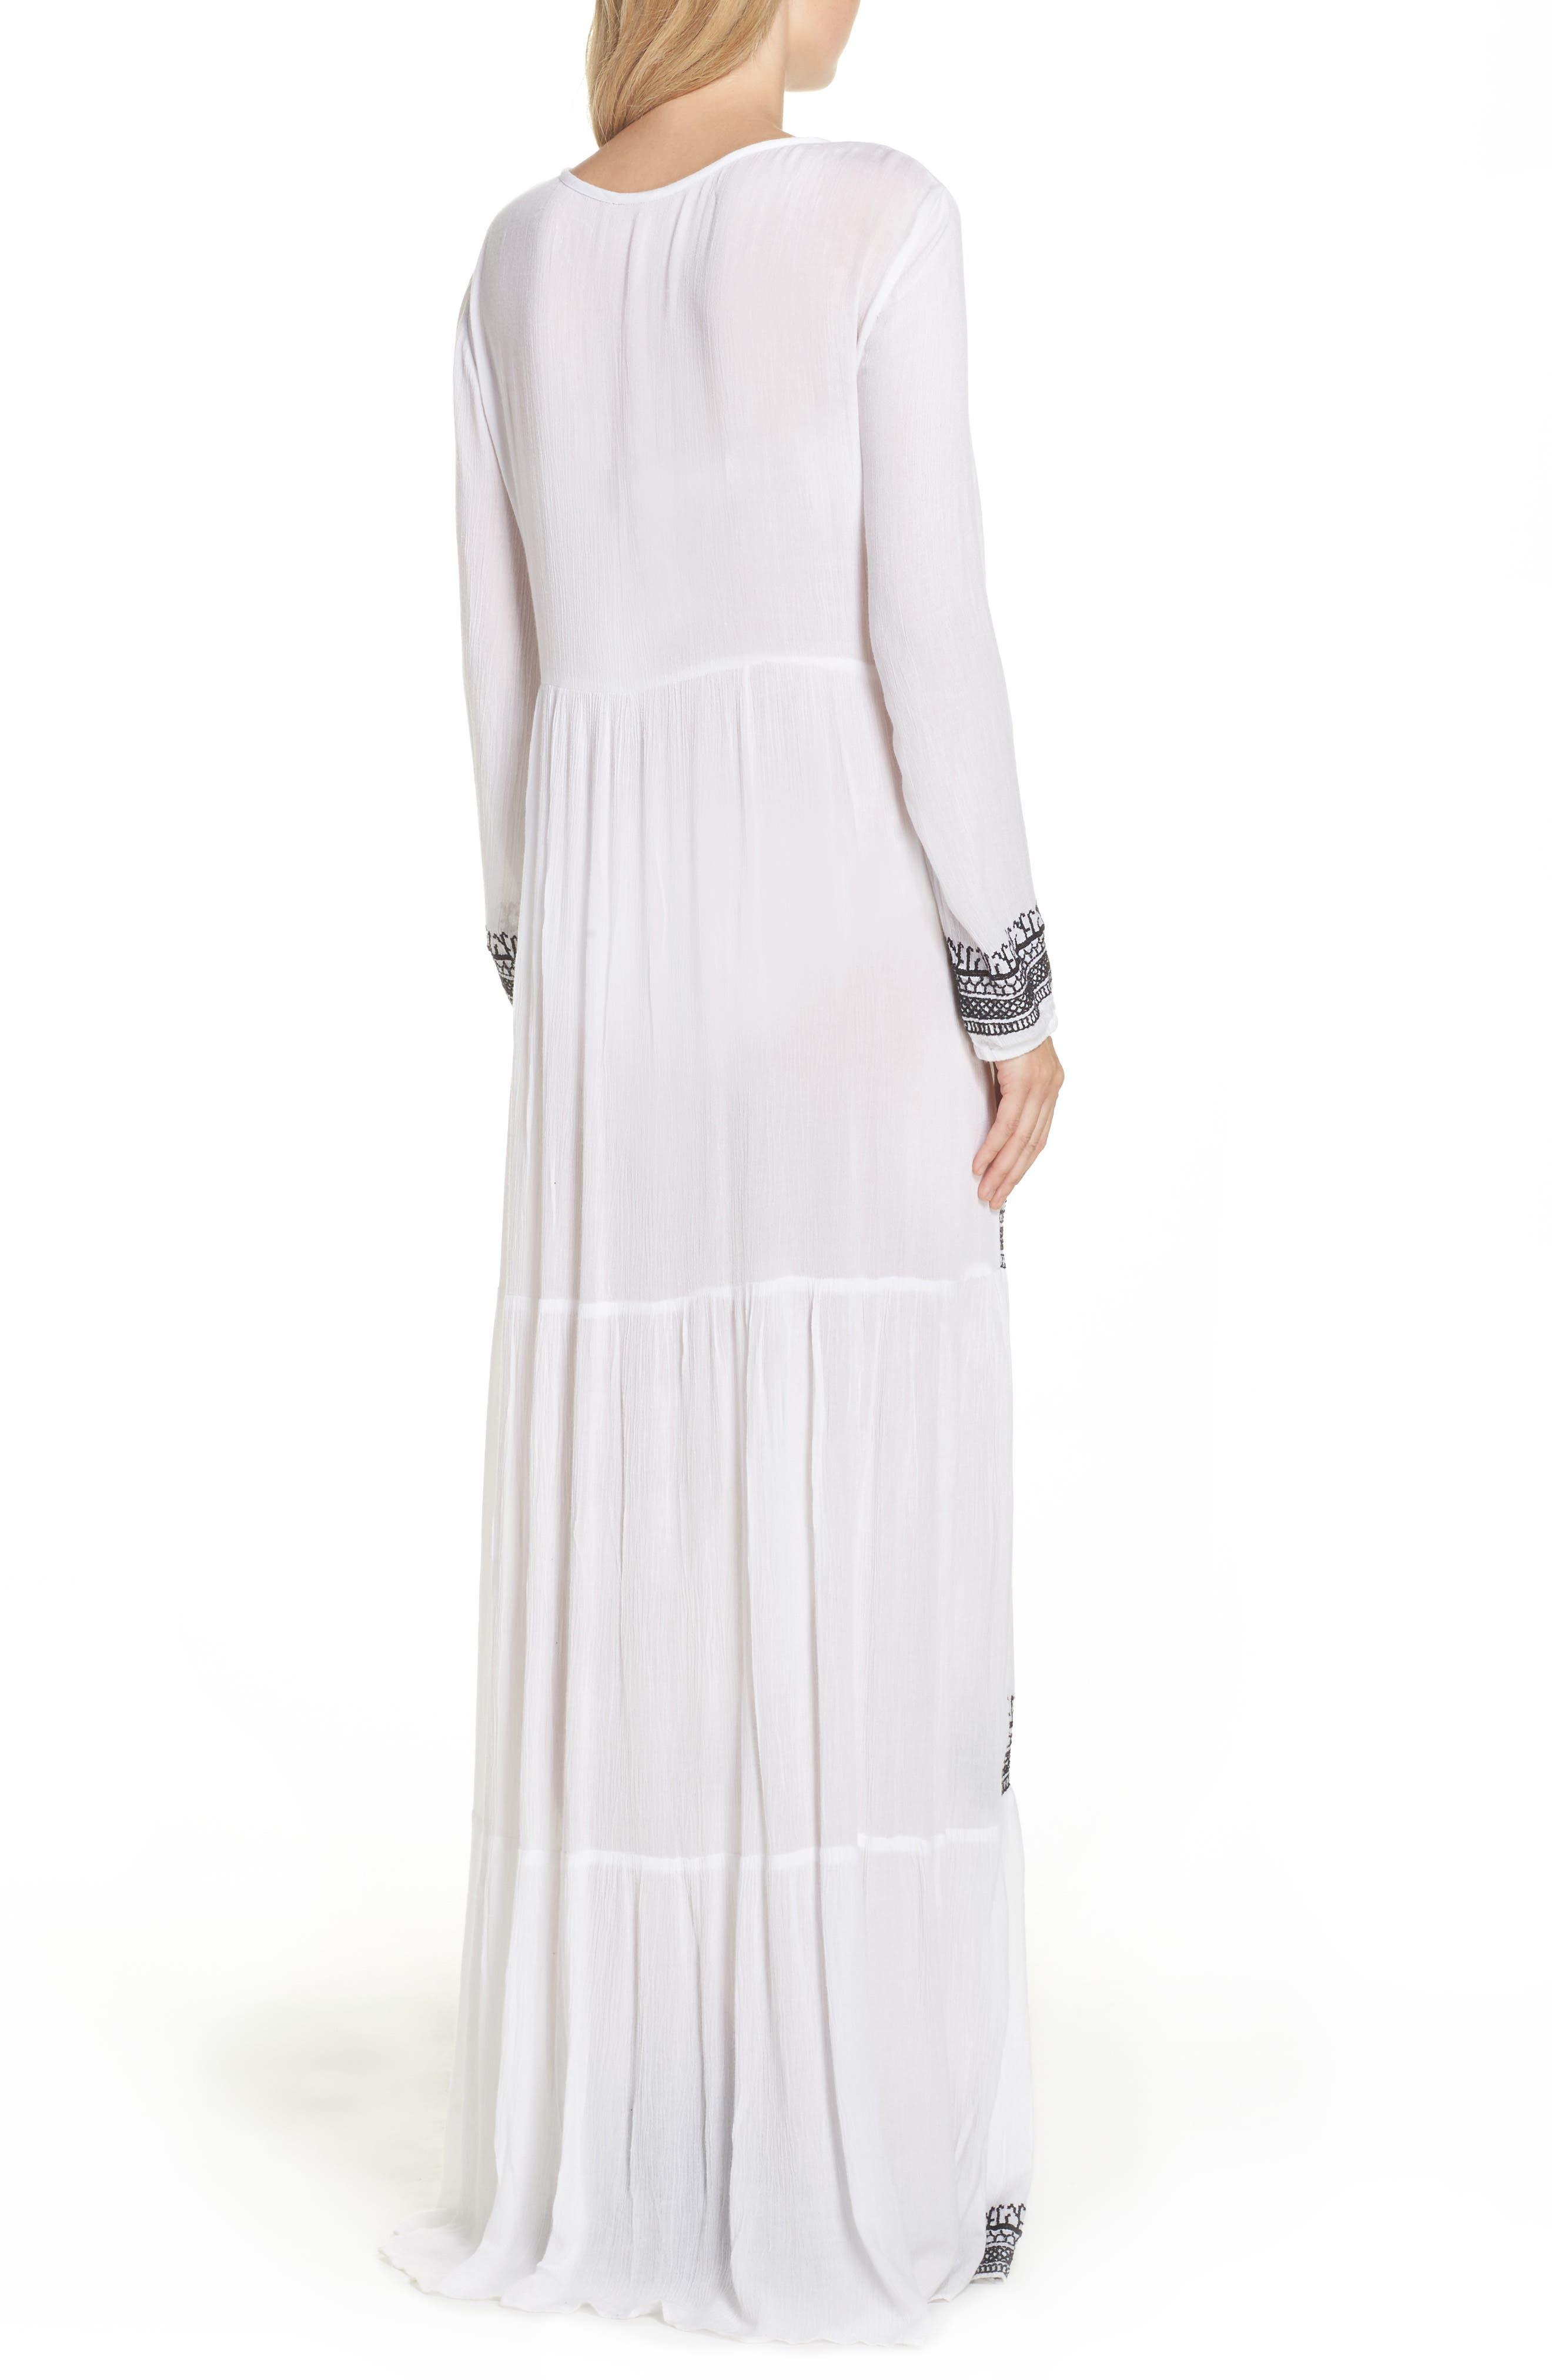 Gitana Maxi Cover-Up Dress,                             Alternate thumbnail 2, color,